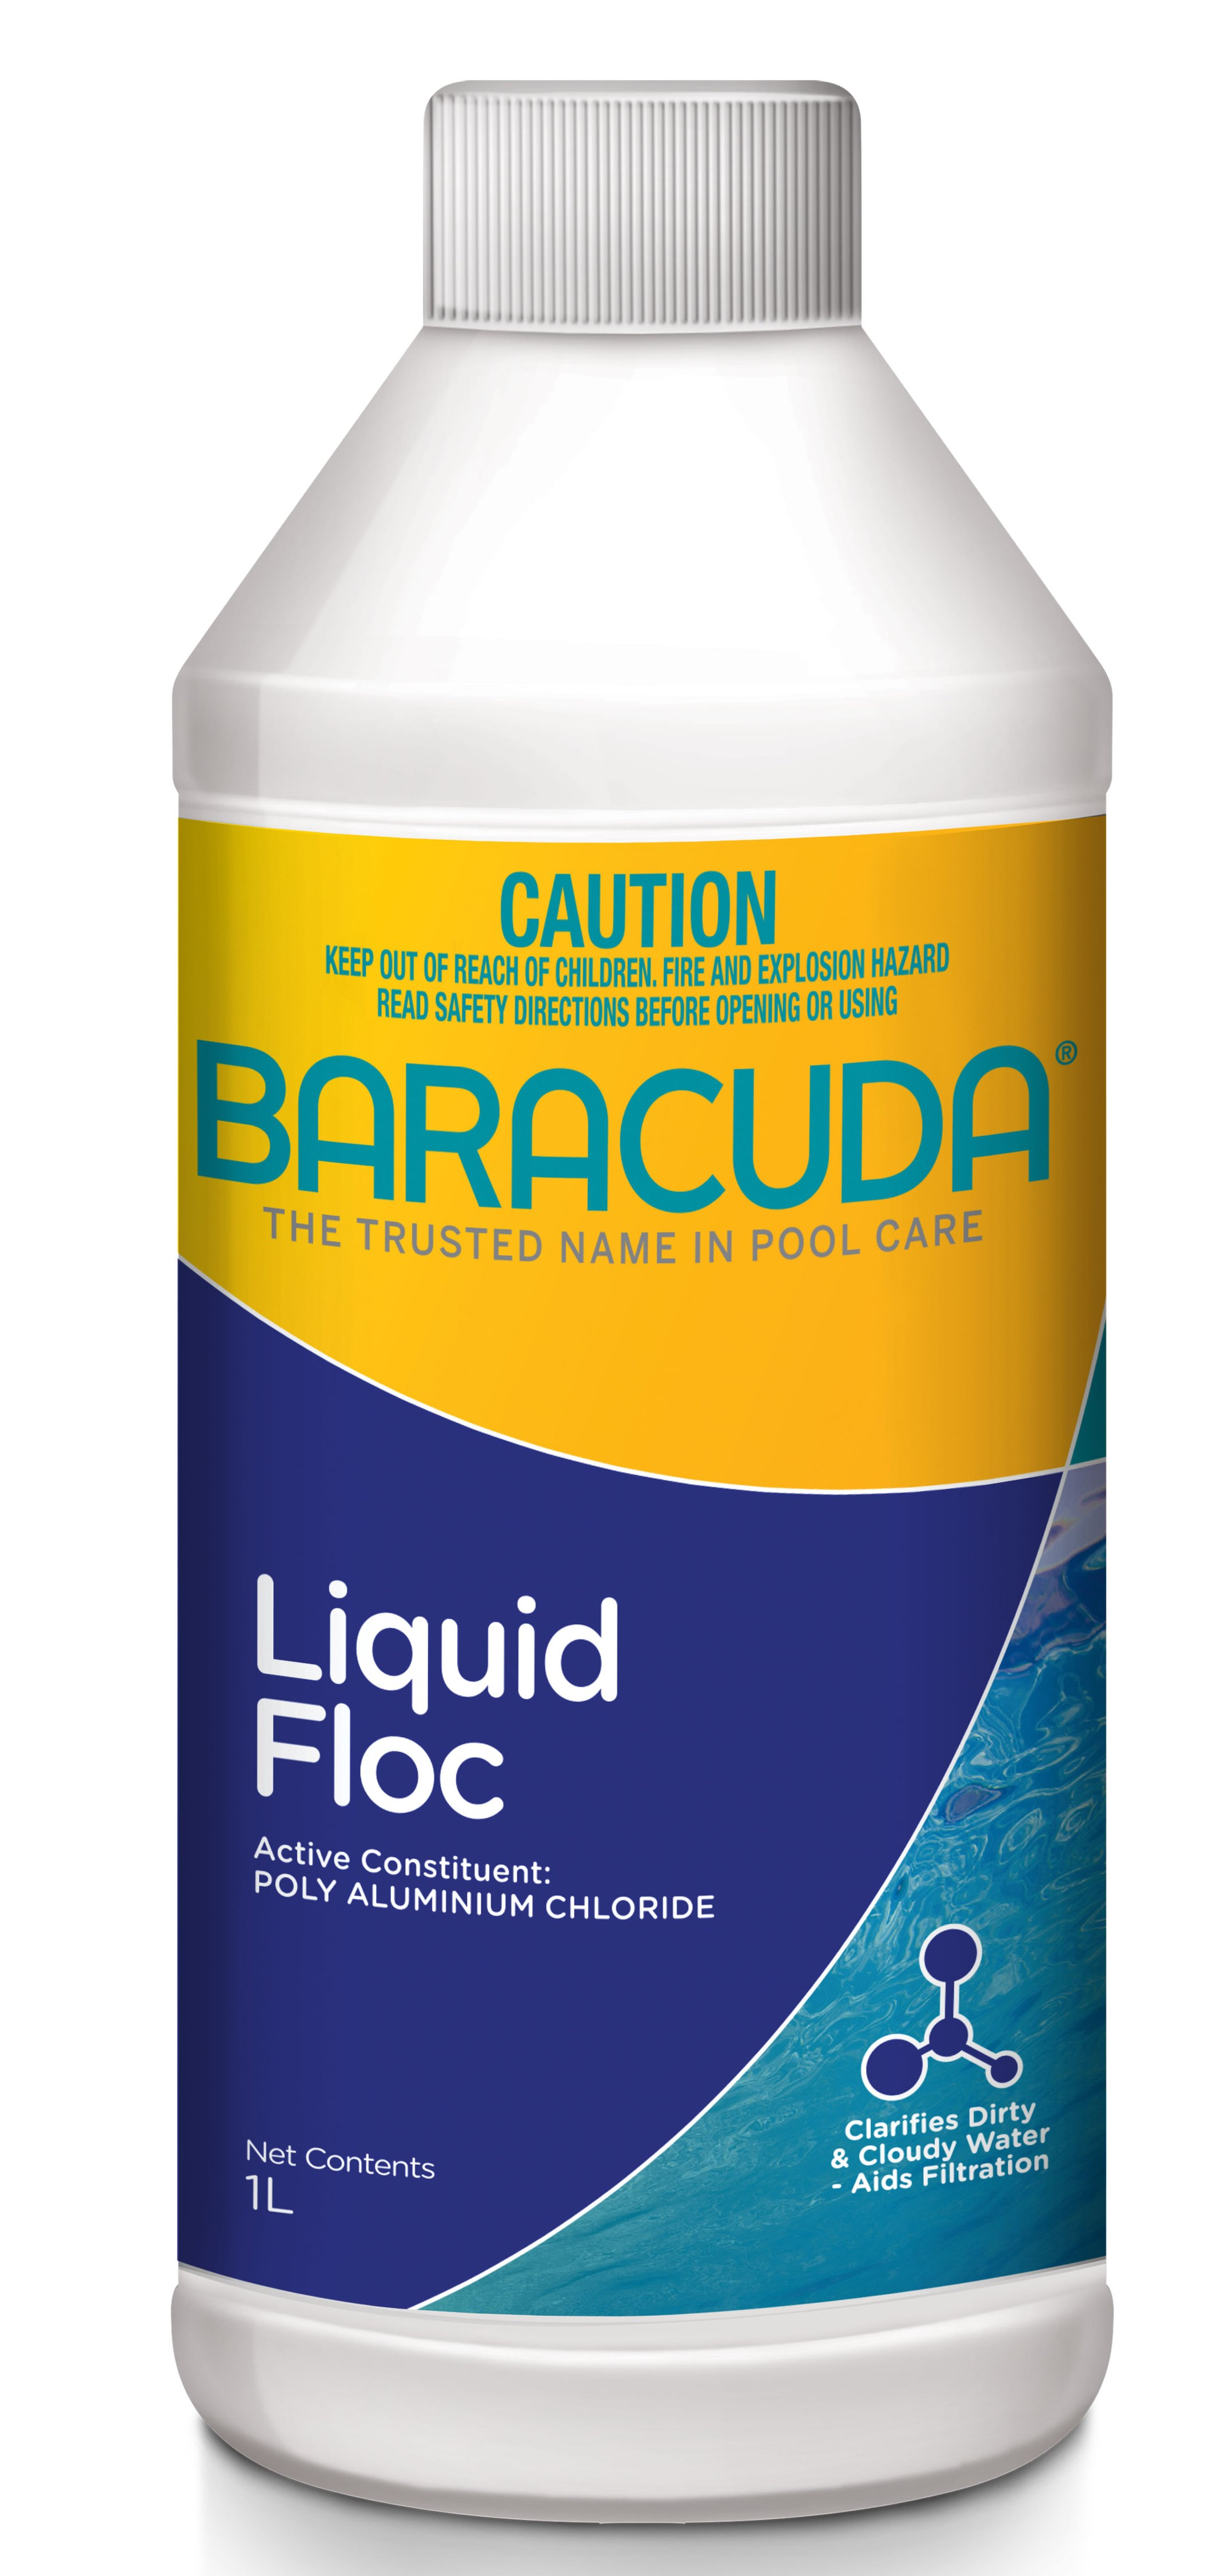 Baracuda Liquid Floc 1L-0